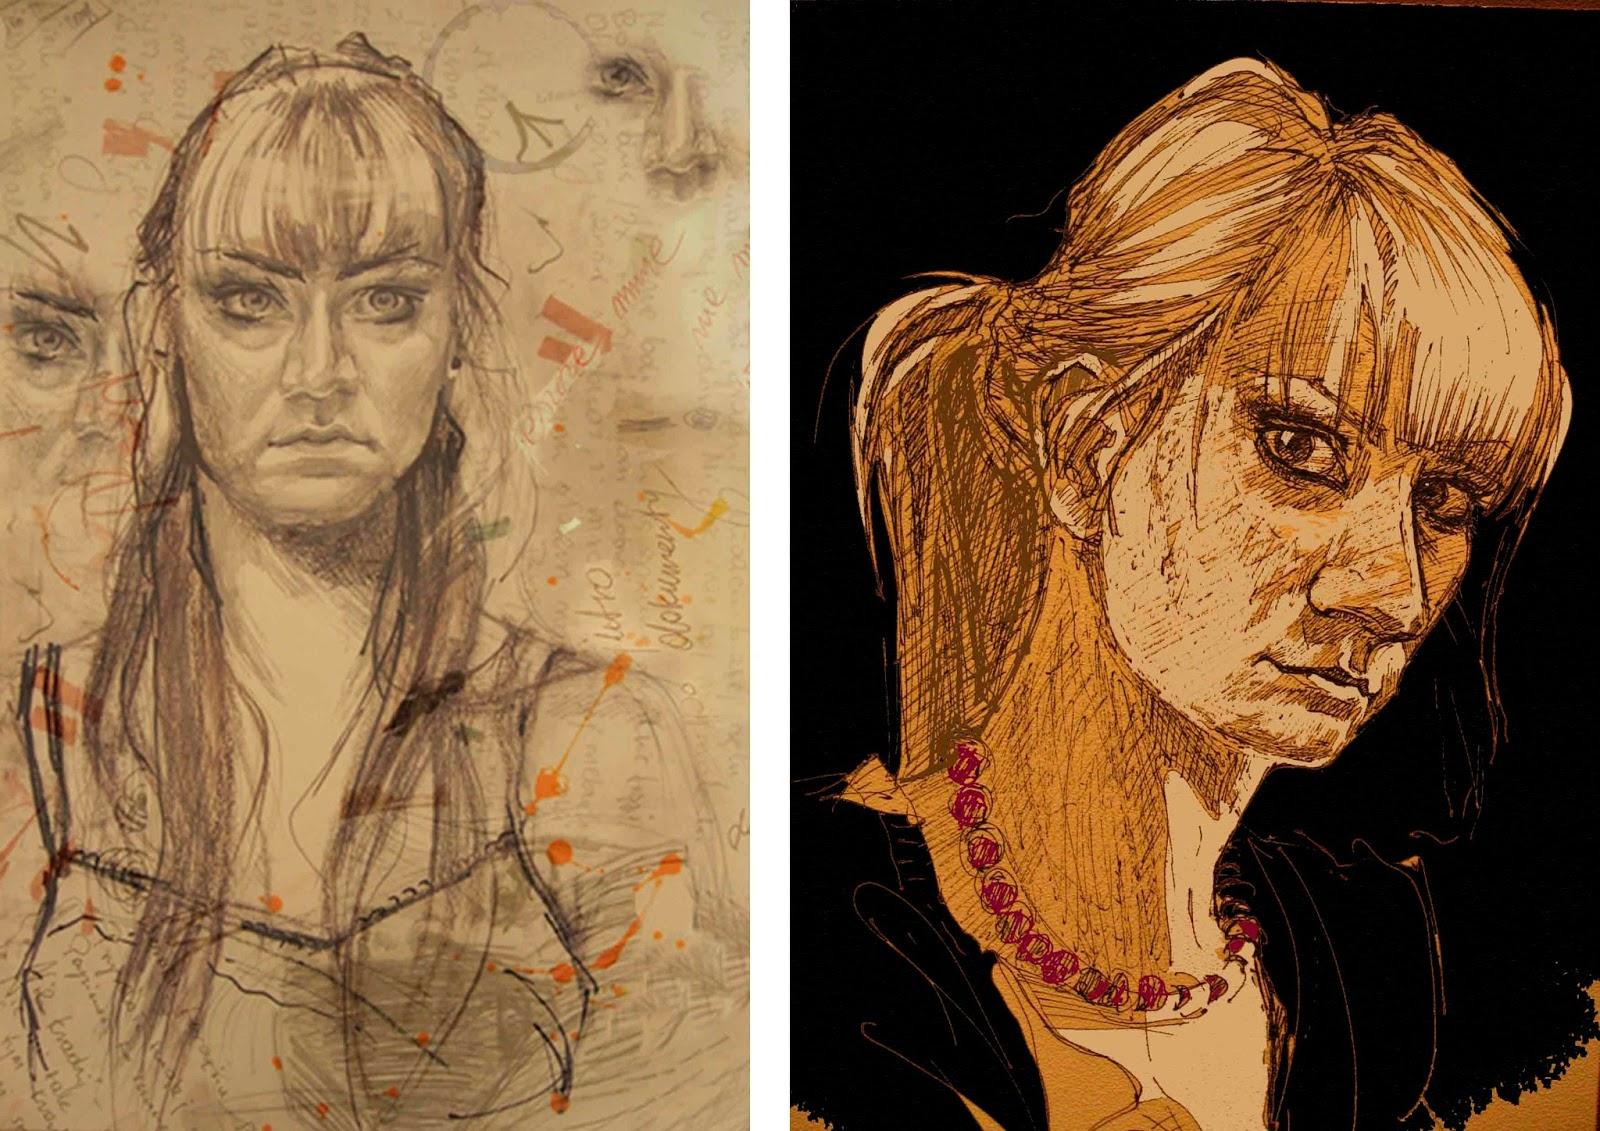 portret autoportret Katarzyna Urbaniak rysunek ilustracja portraits draw sketches ink pen pencil mixed trechiques reflection in the mirror interestinng portrait illustration